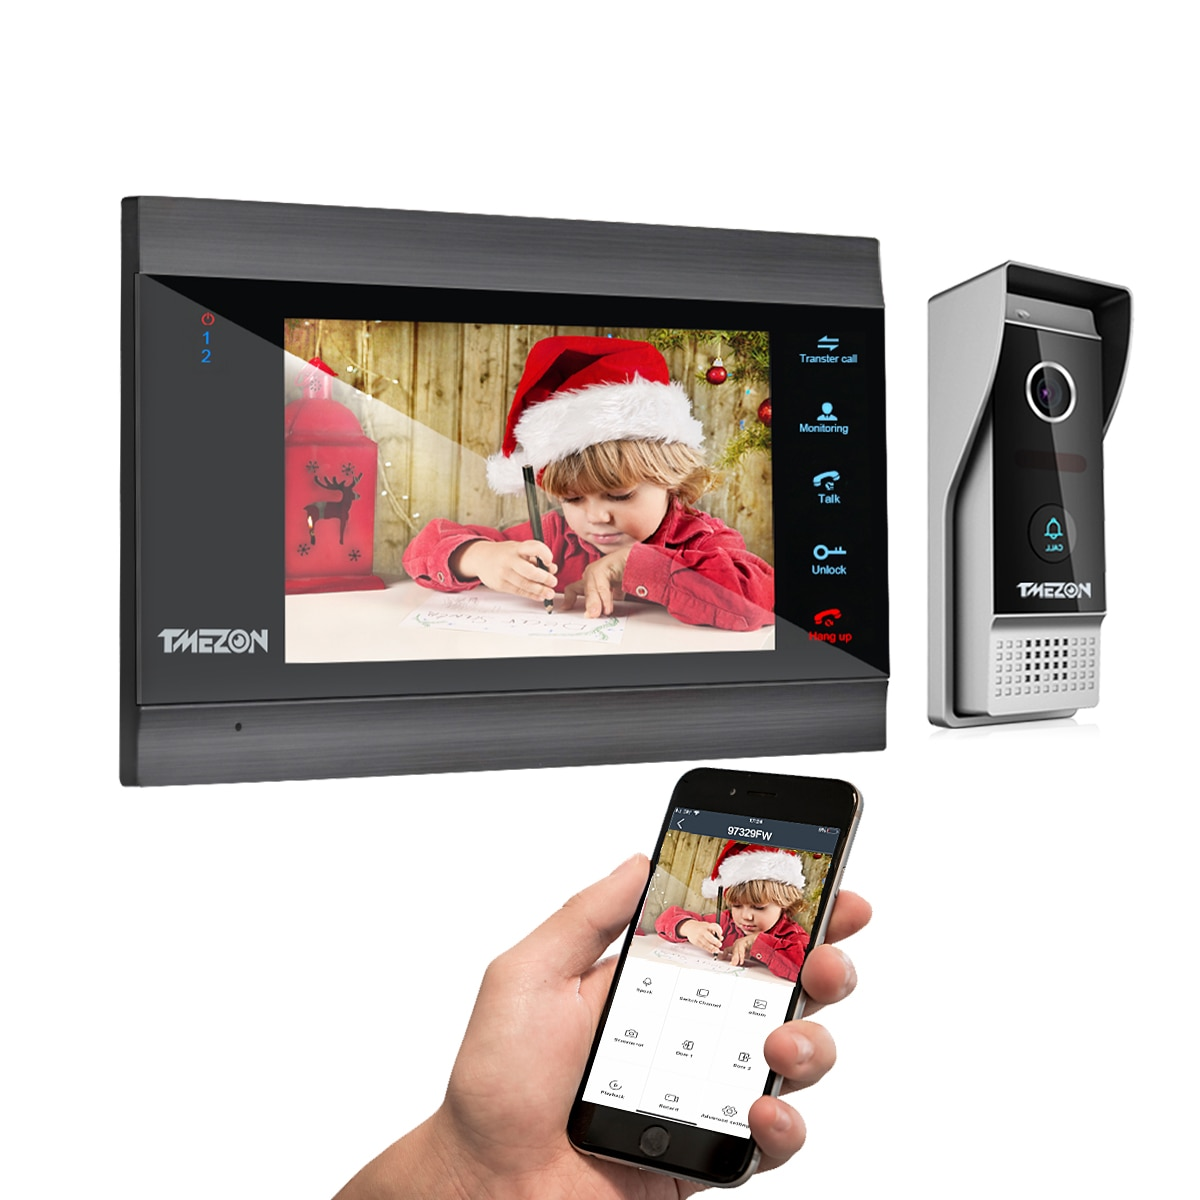 TMEZON Tuya App Home Intercom System Wireless WiFi Smart IP Video Doorbell 1080P 7 Inch with 1x1080P Wired Door Phone Camera